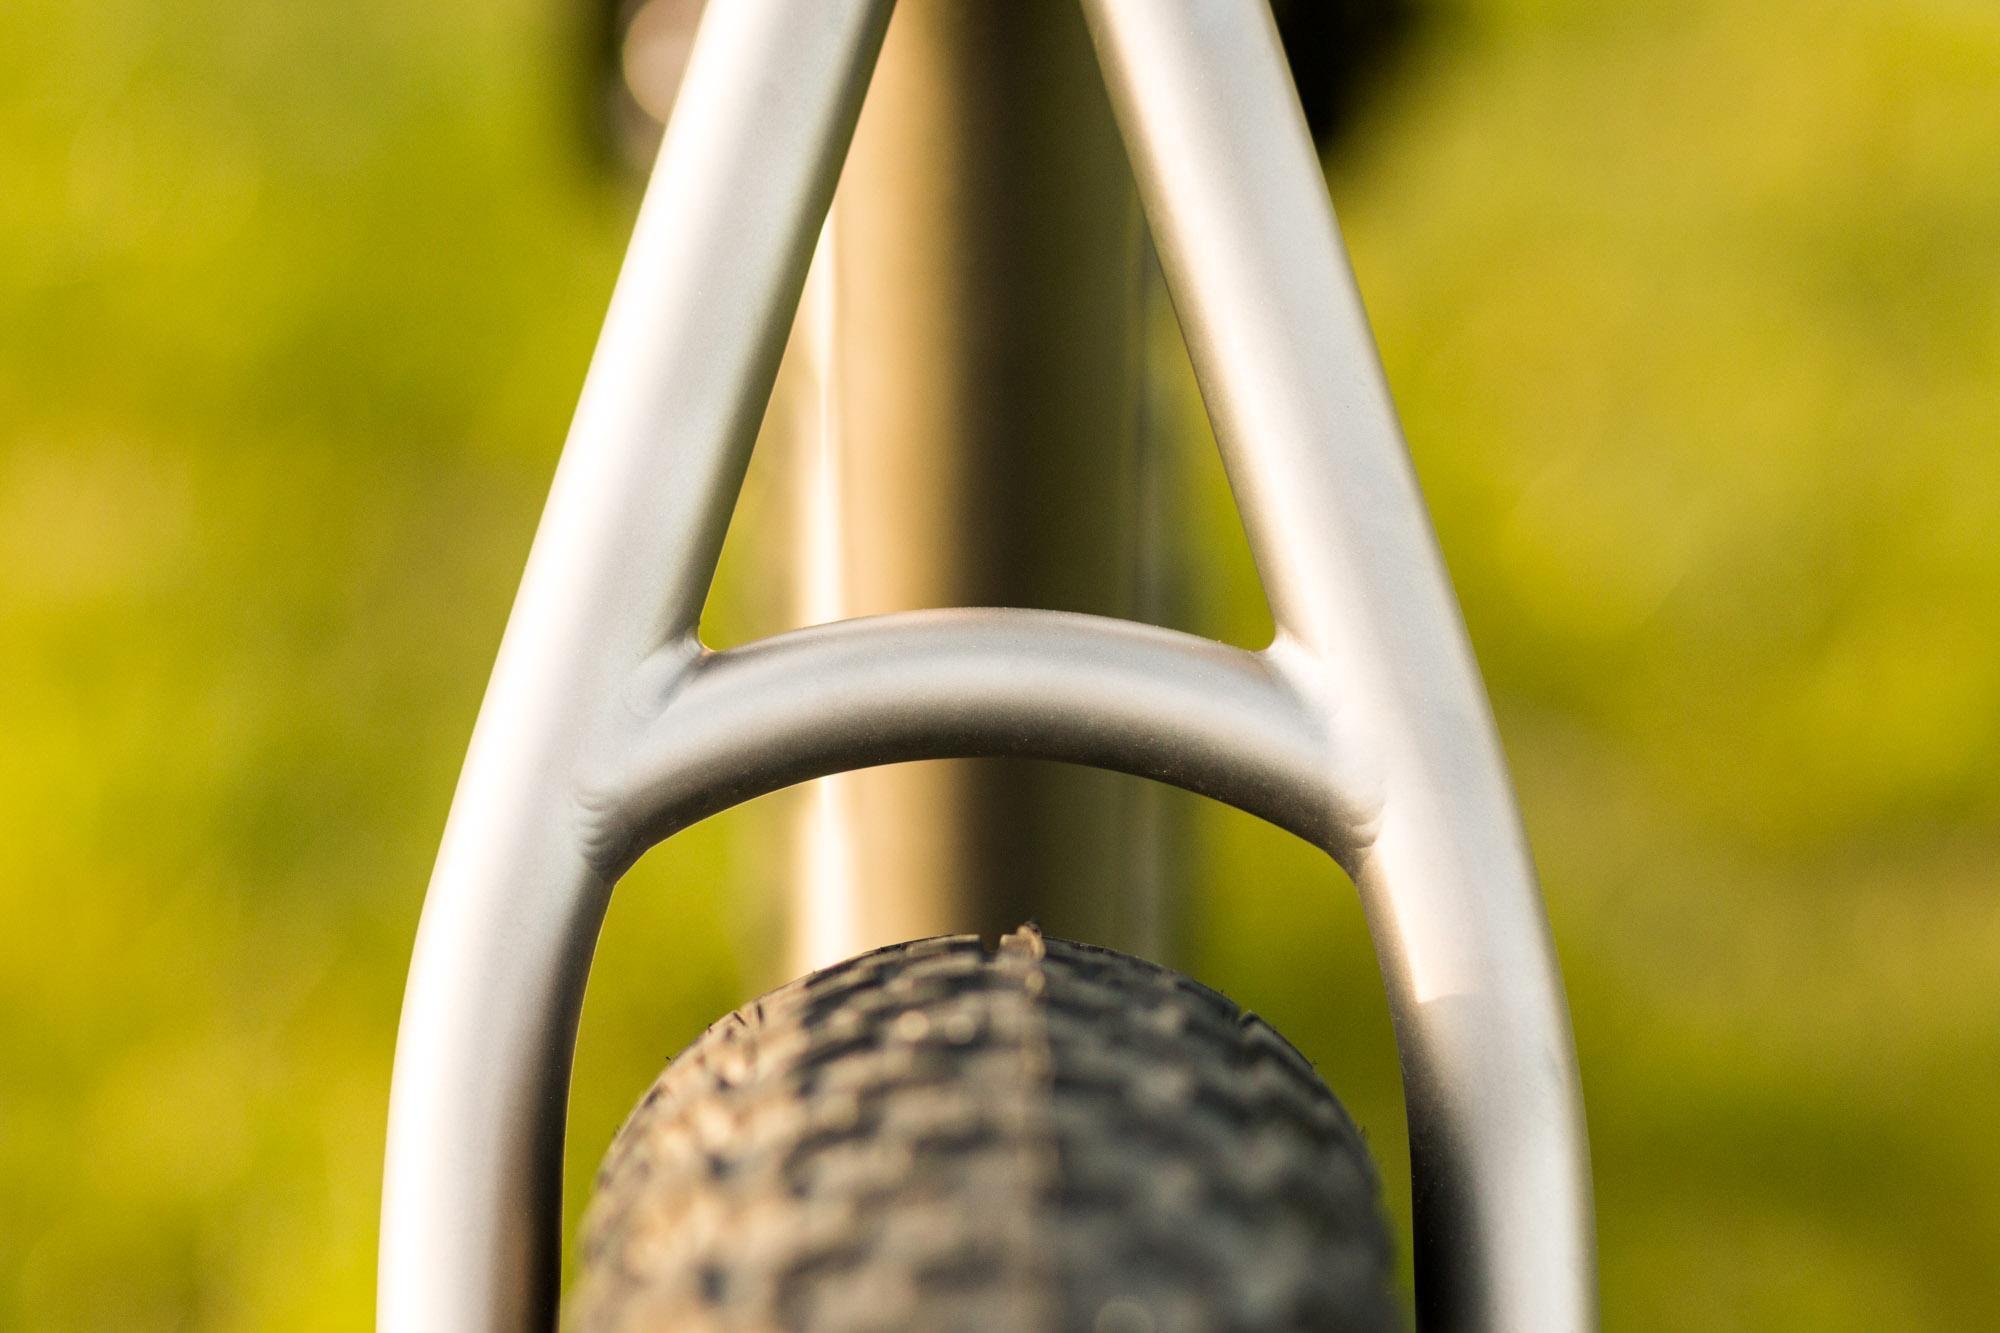 George's Landyachtz Titanium Drop Bar 29+ is a Beast! –Morgan Taylor